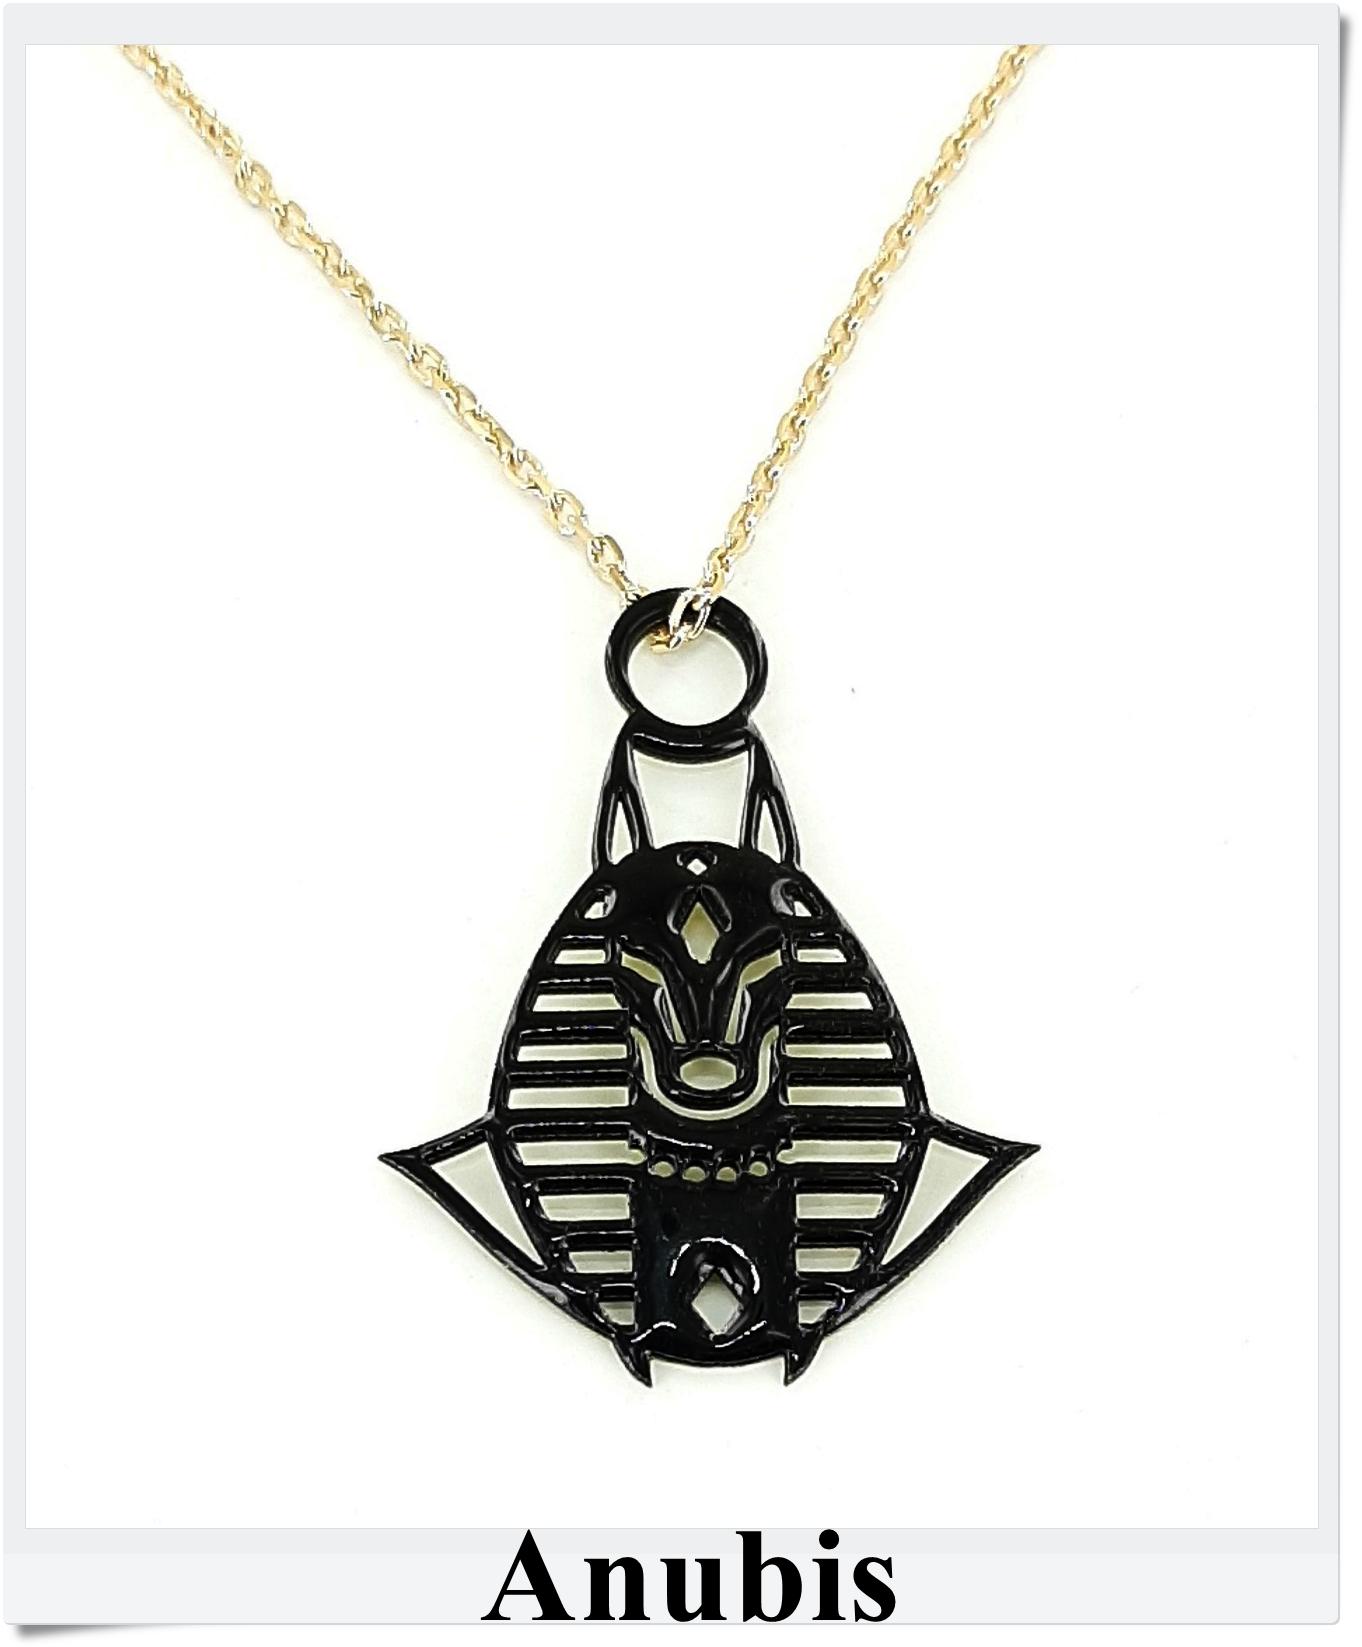 Anubis bijou Égypte